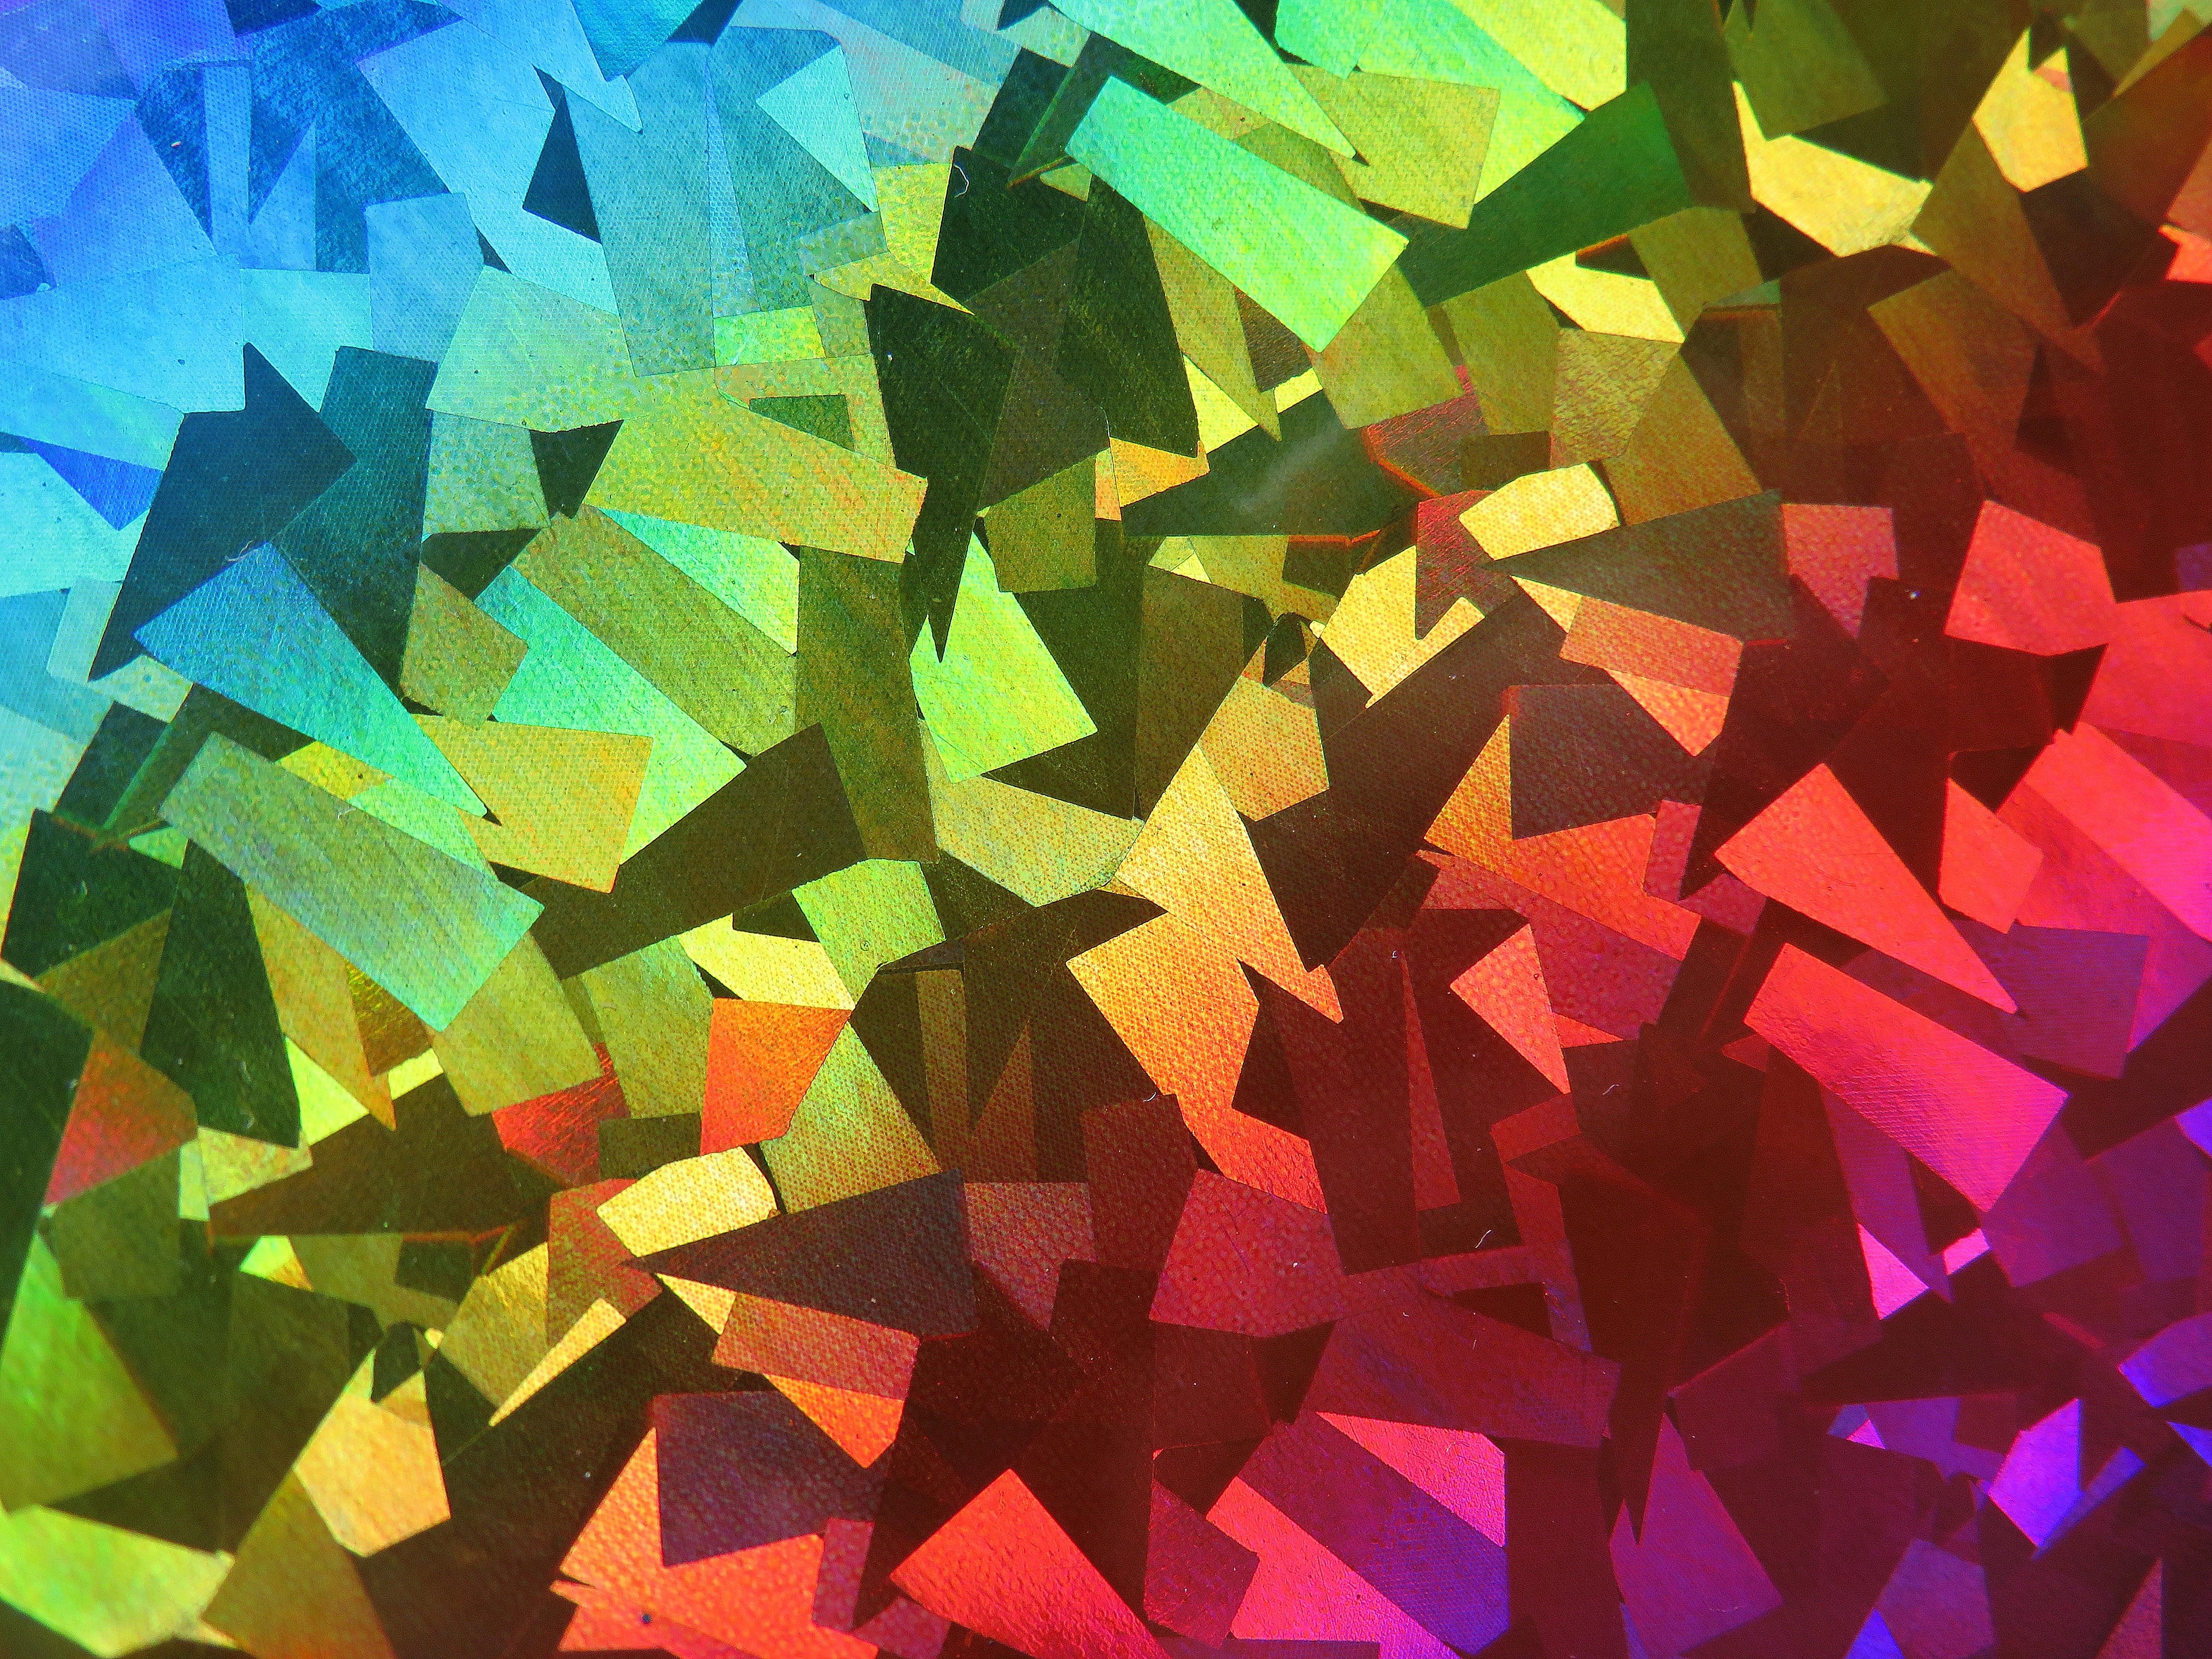 abstract shapes 1575660142 - Abstract Shapes -